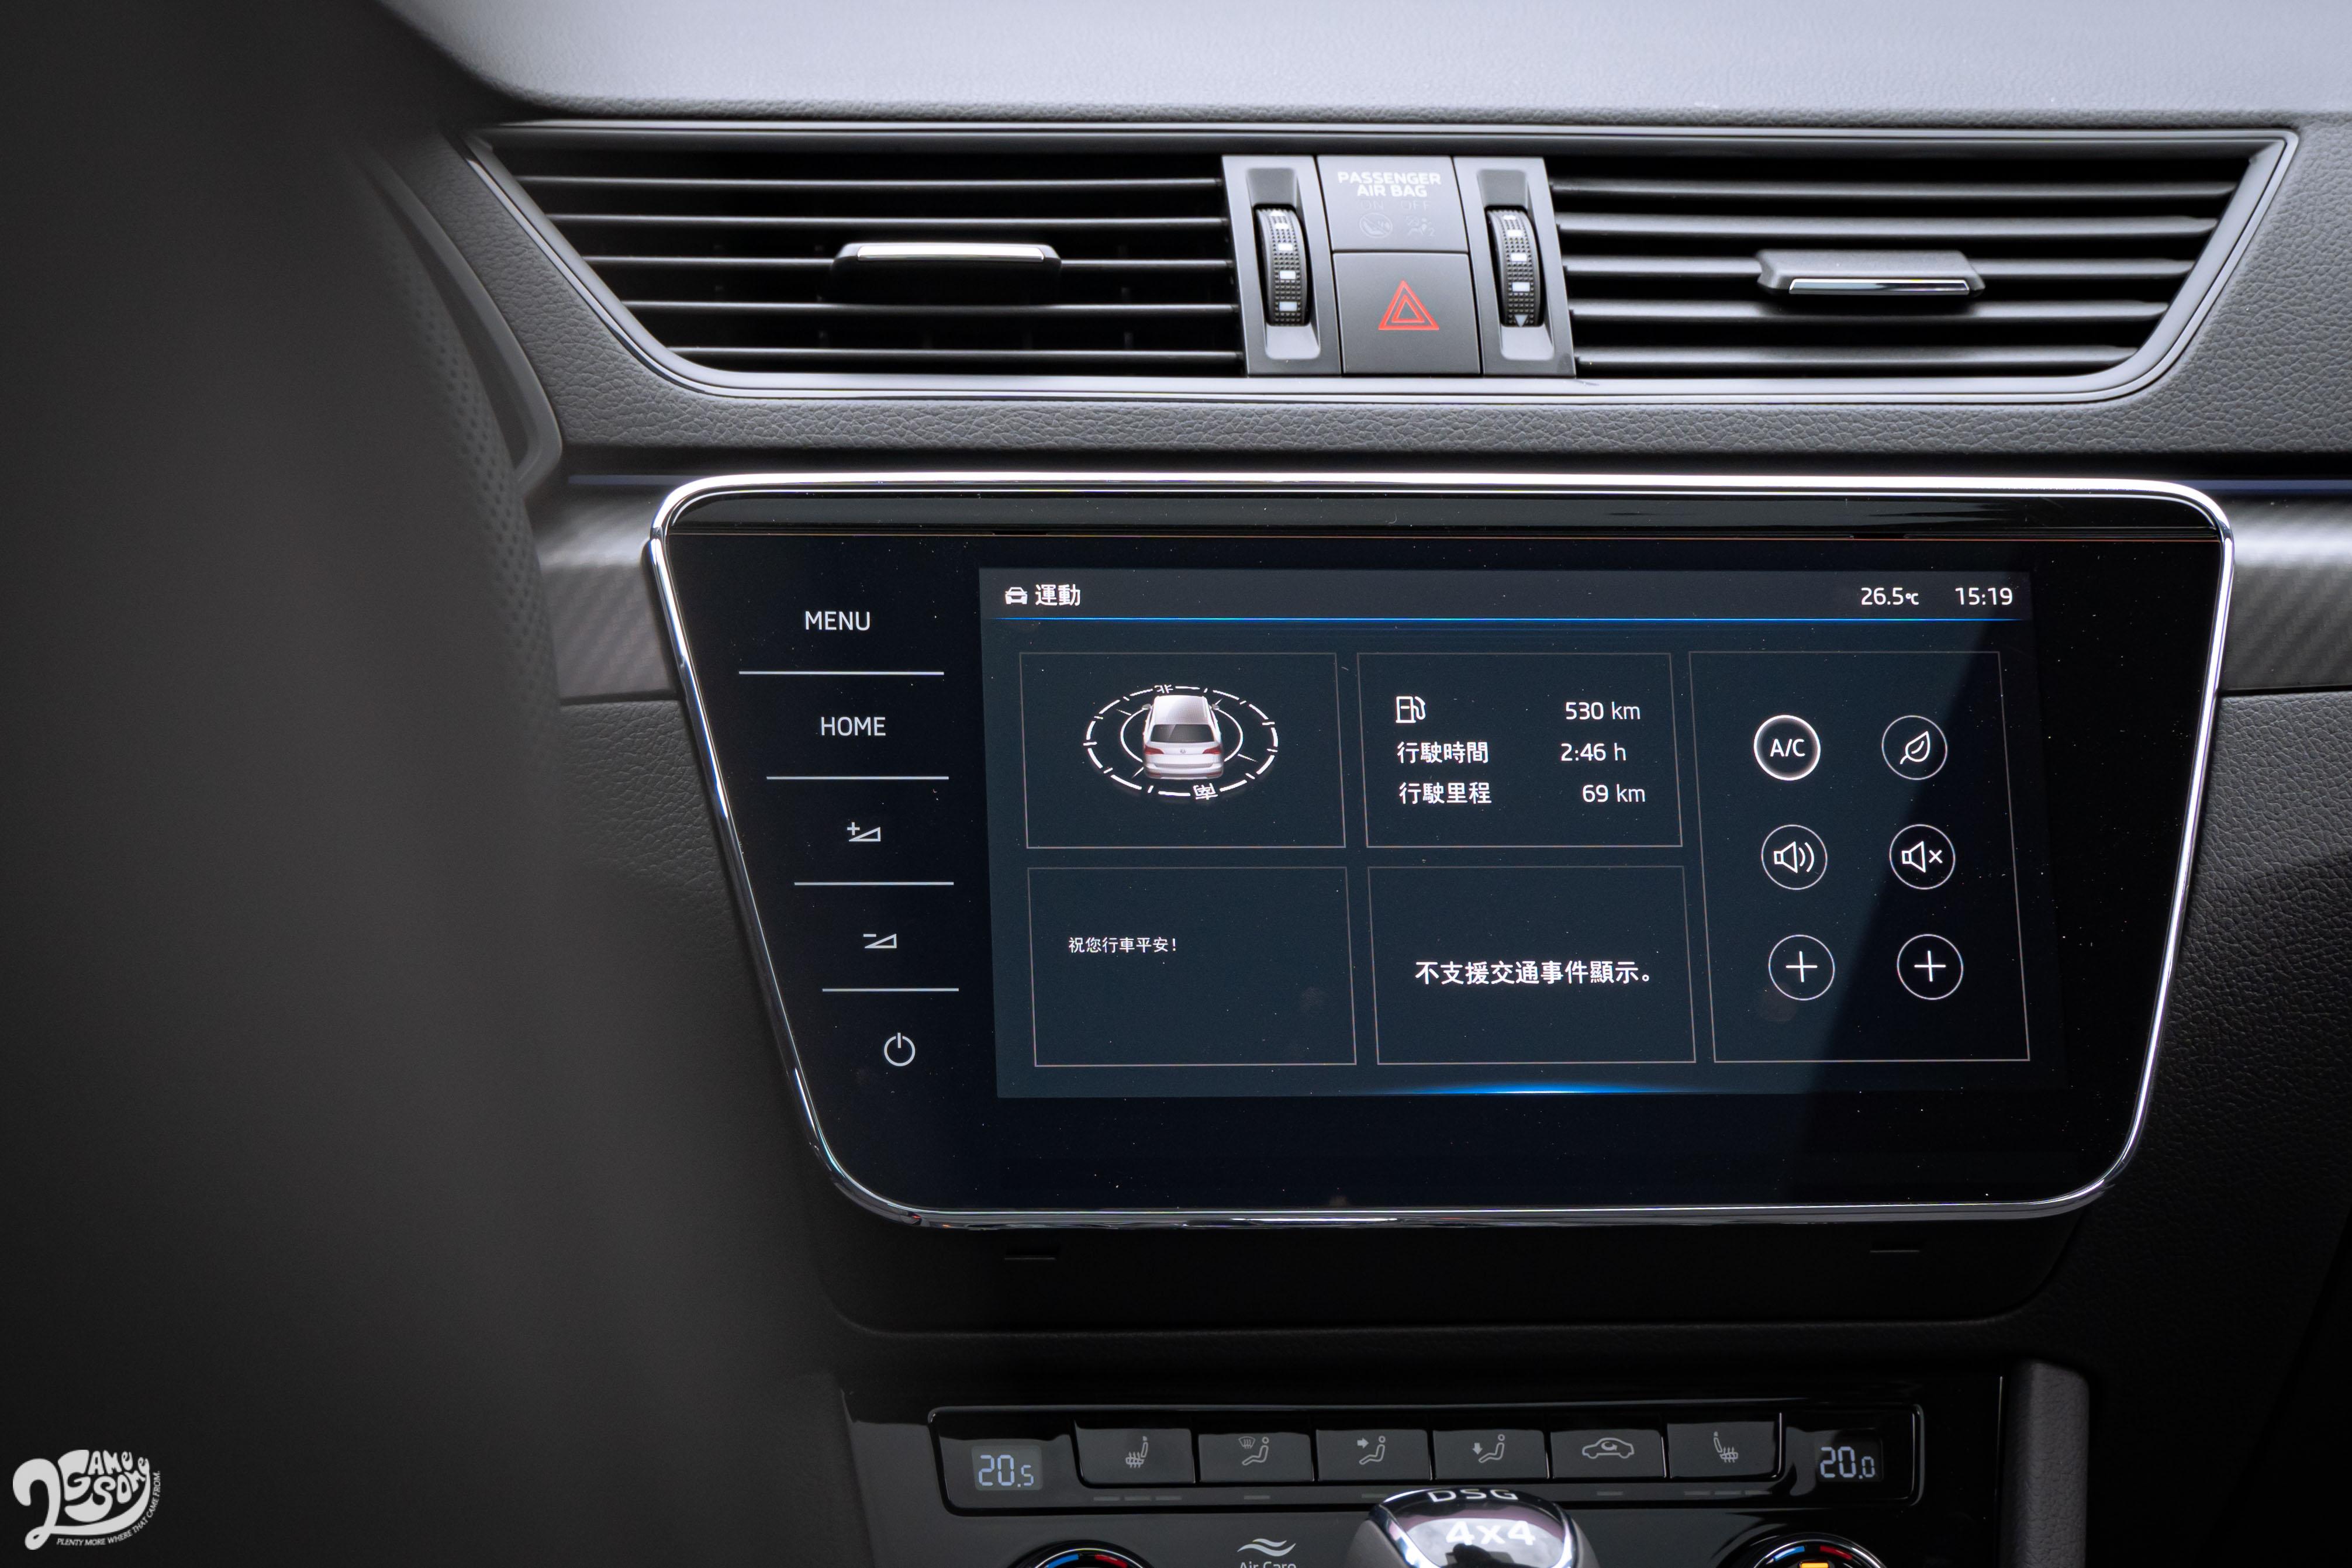 Superb 全車系標配第三代資訊娛樂系統,中控螢幕放大至 9.2 吋。